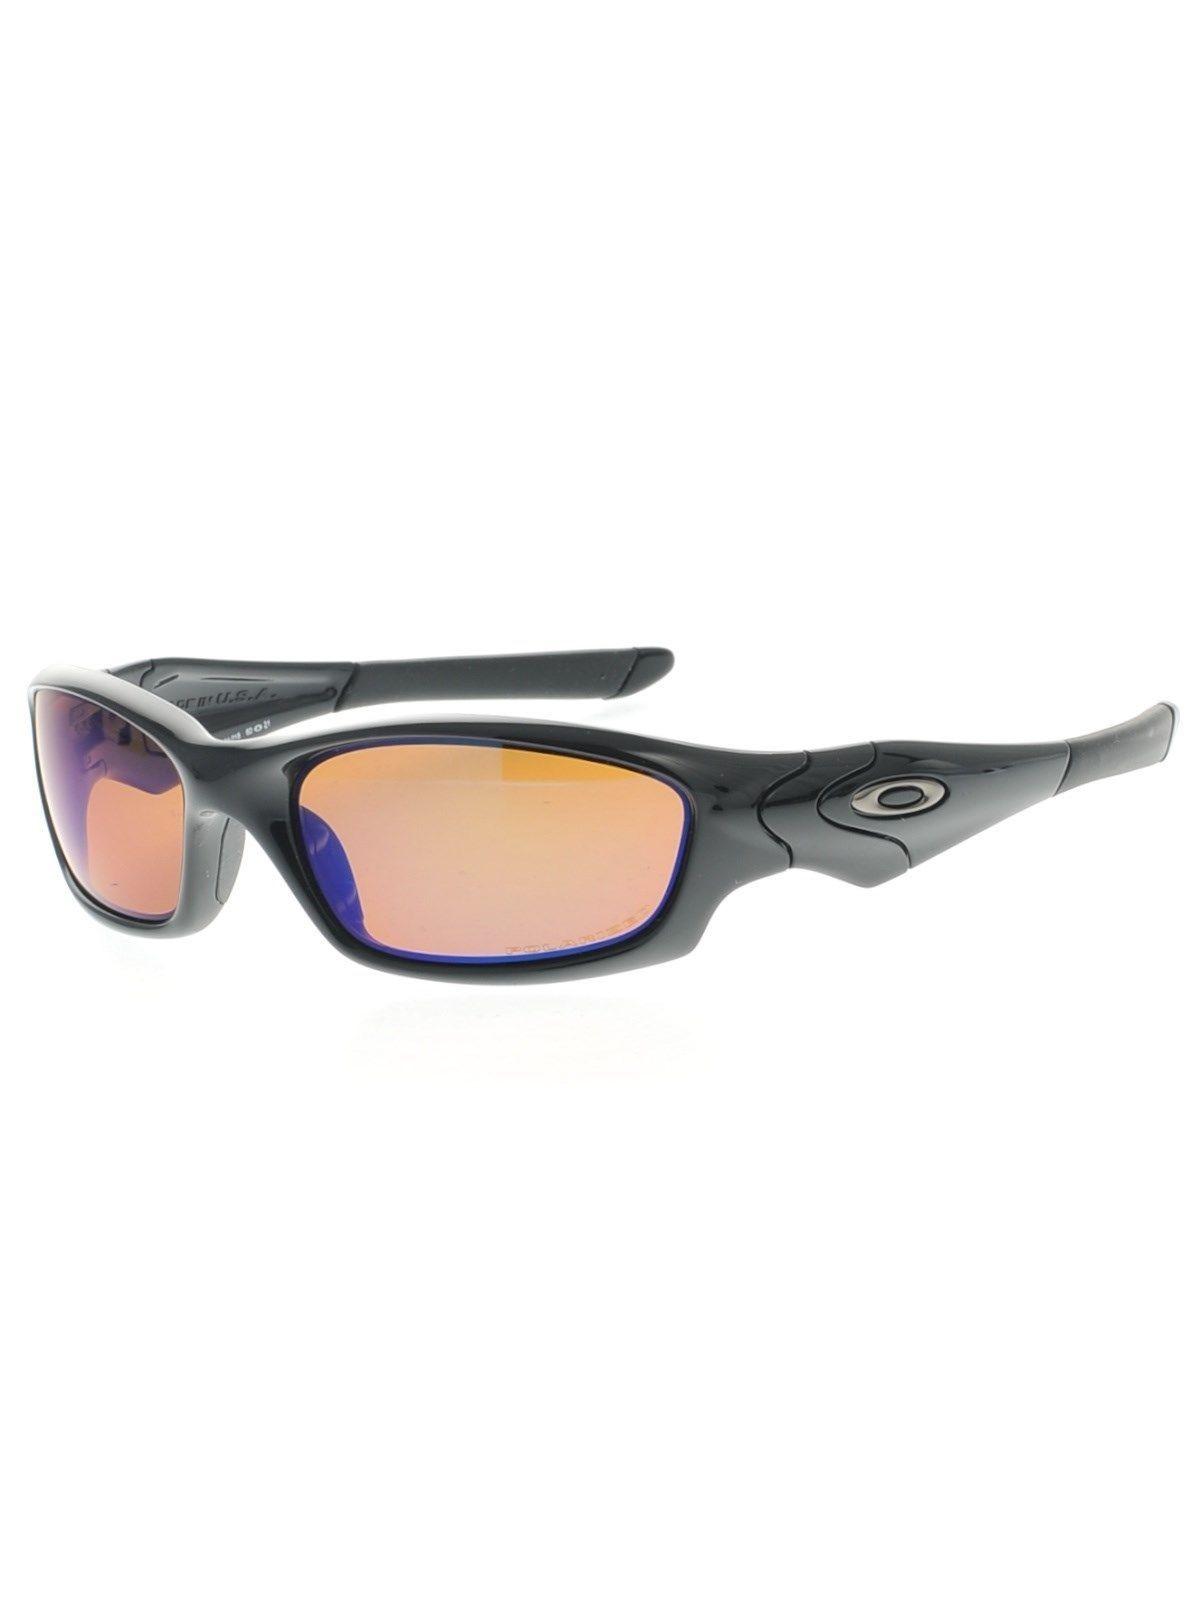 Nuevo Oakley Chaqueta Recta Negro Pulido Wshallow Azul IRIDIO Polarizado 24-018